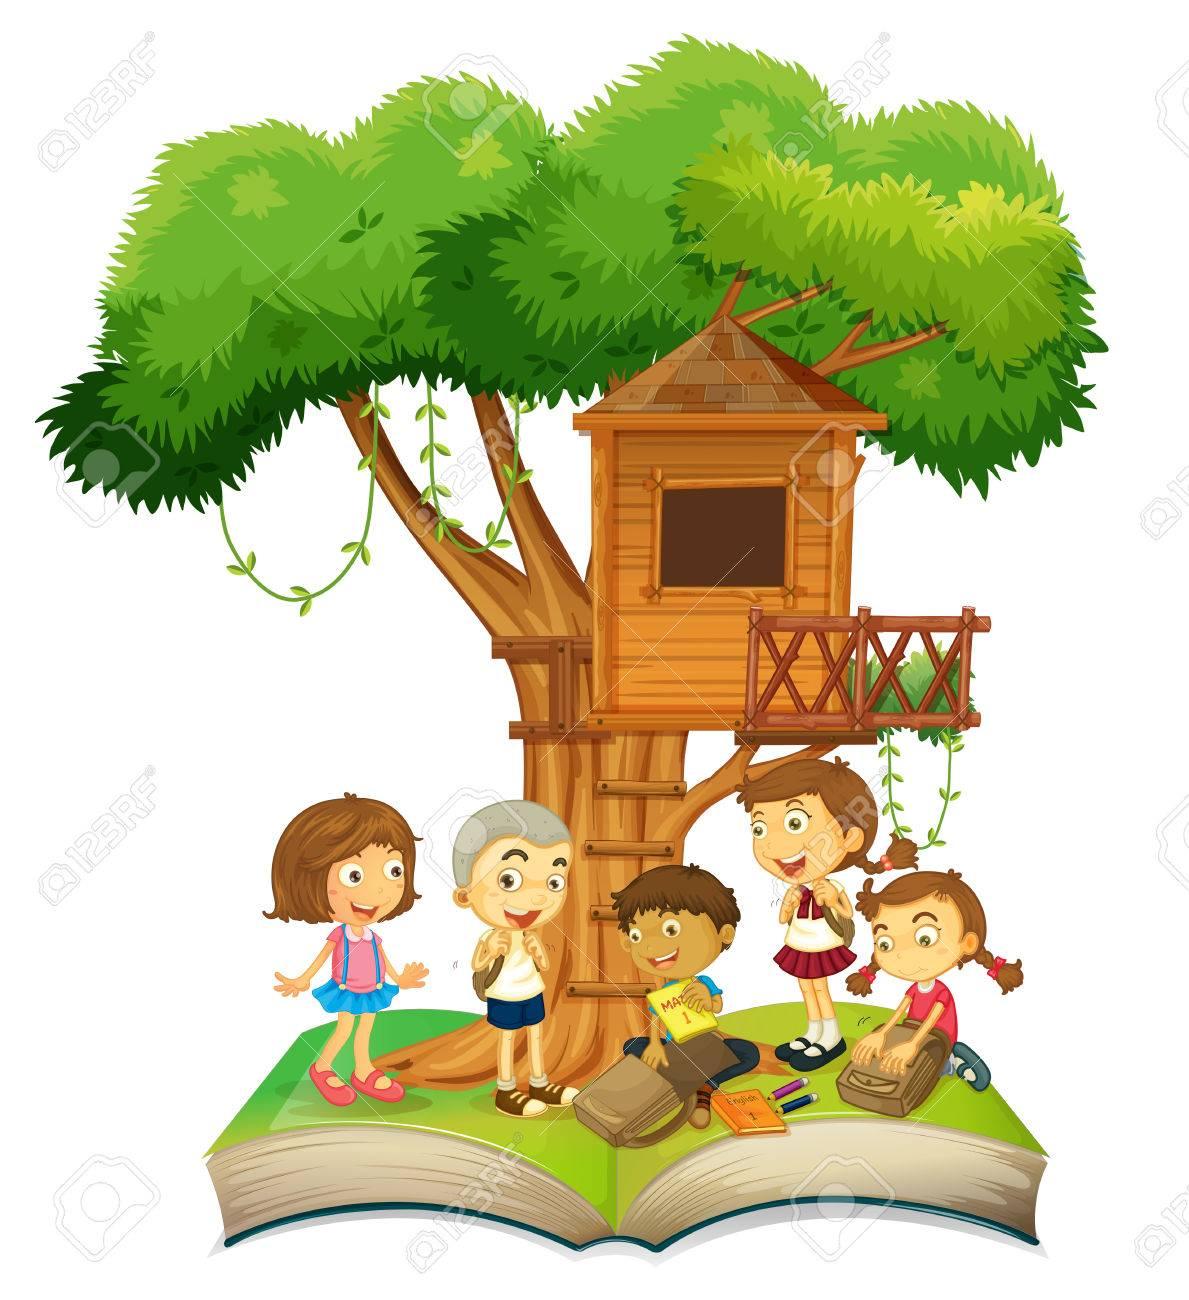 book of children and treehouse illustration royalty free cliparts rh 123rf com Diaper Clip Art Diaper Clip Art